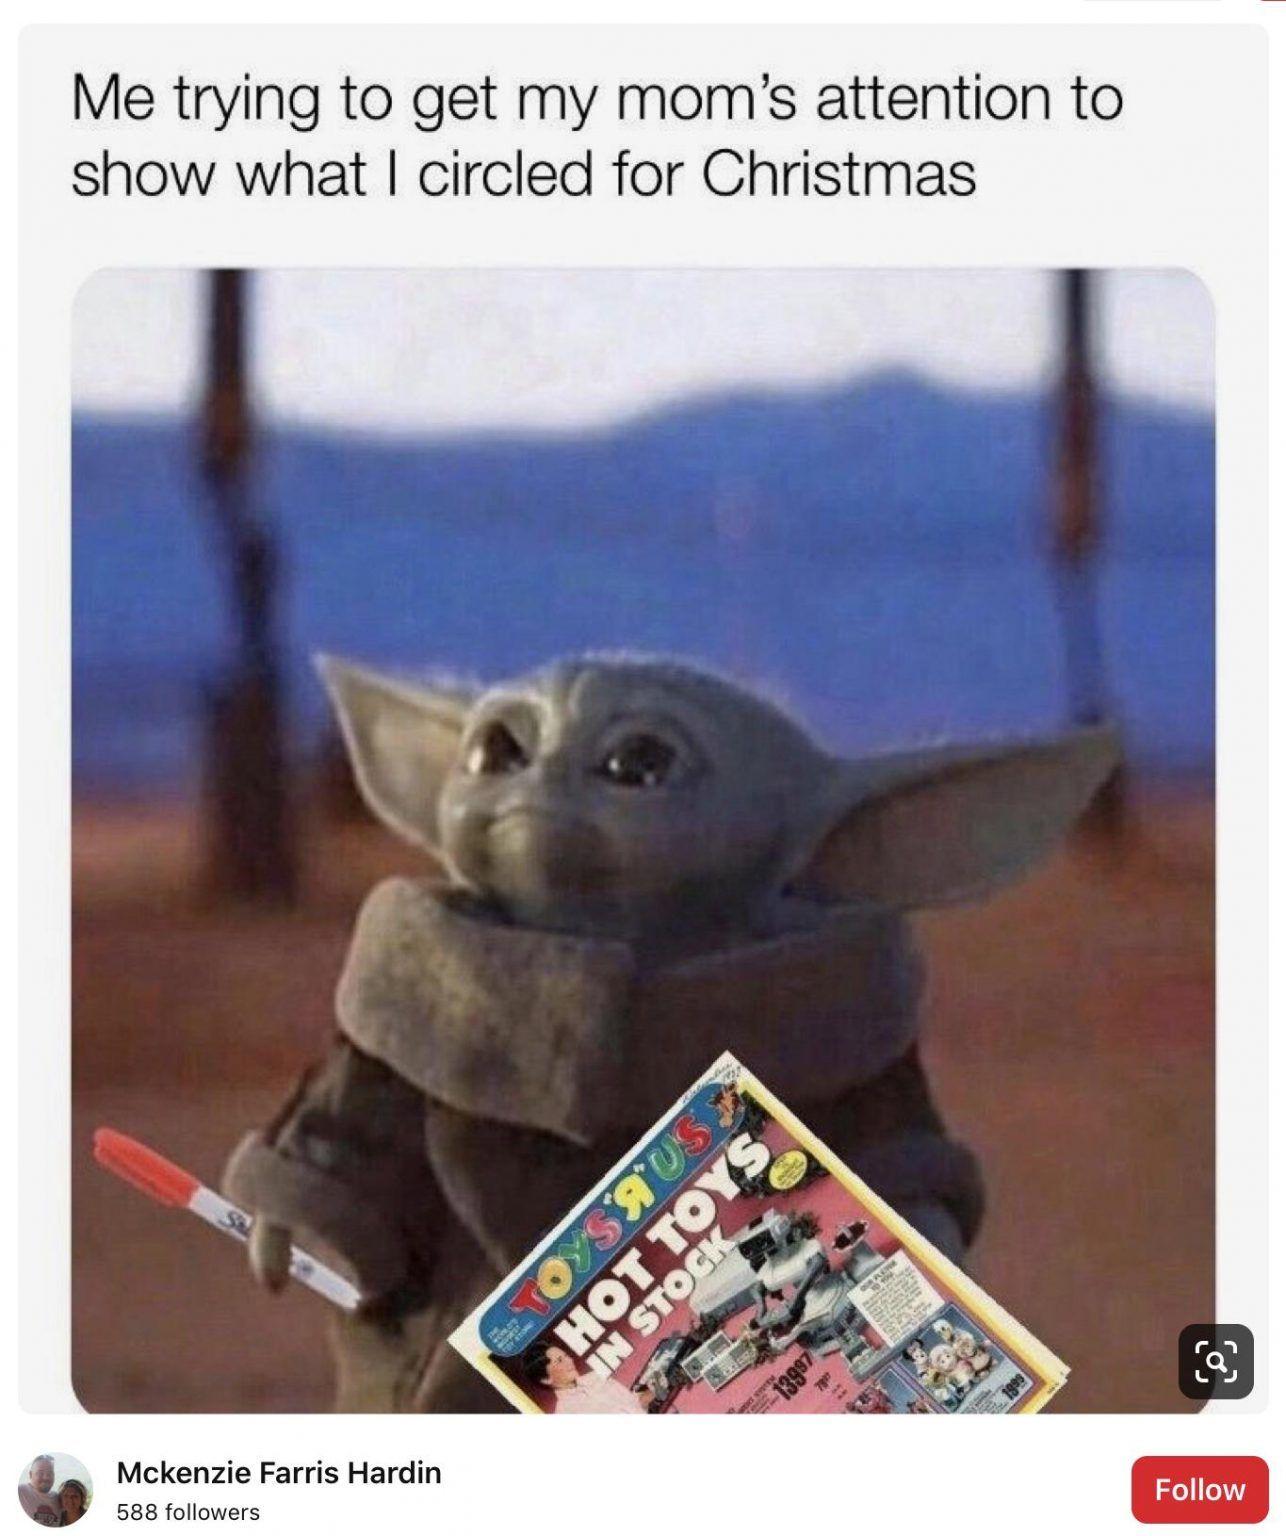 19 Adorable Baby Yoda Memes For Christmas 2020 12 Funny Star Wars Memes Yoda Funny Yoda Meme